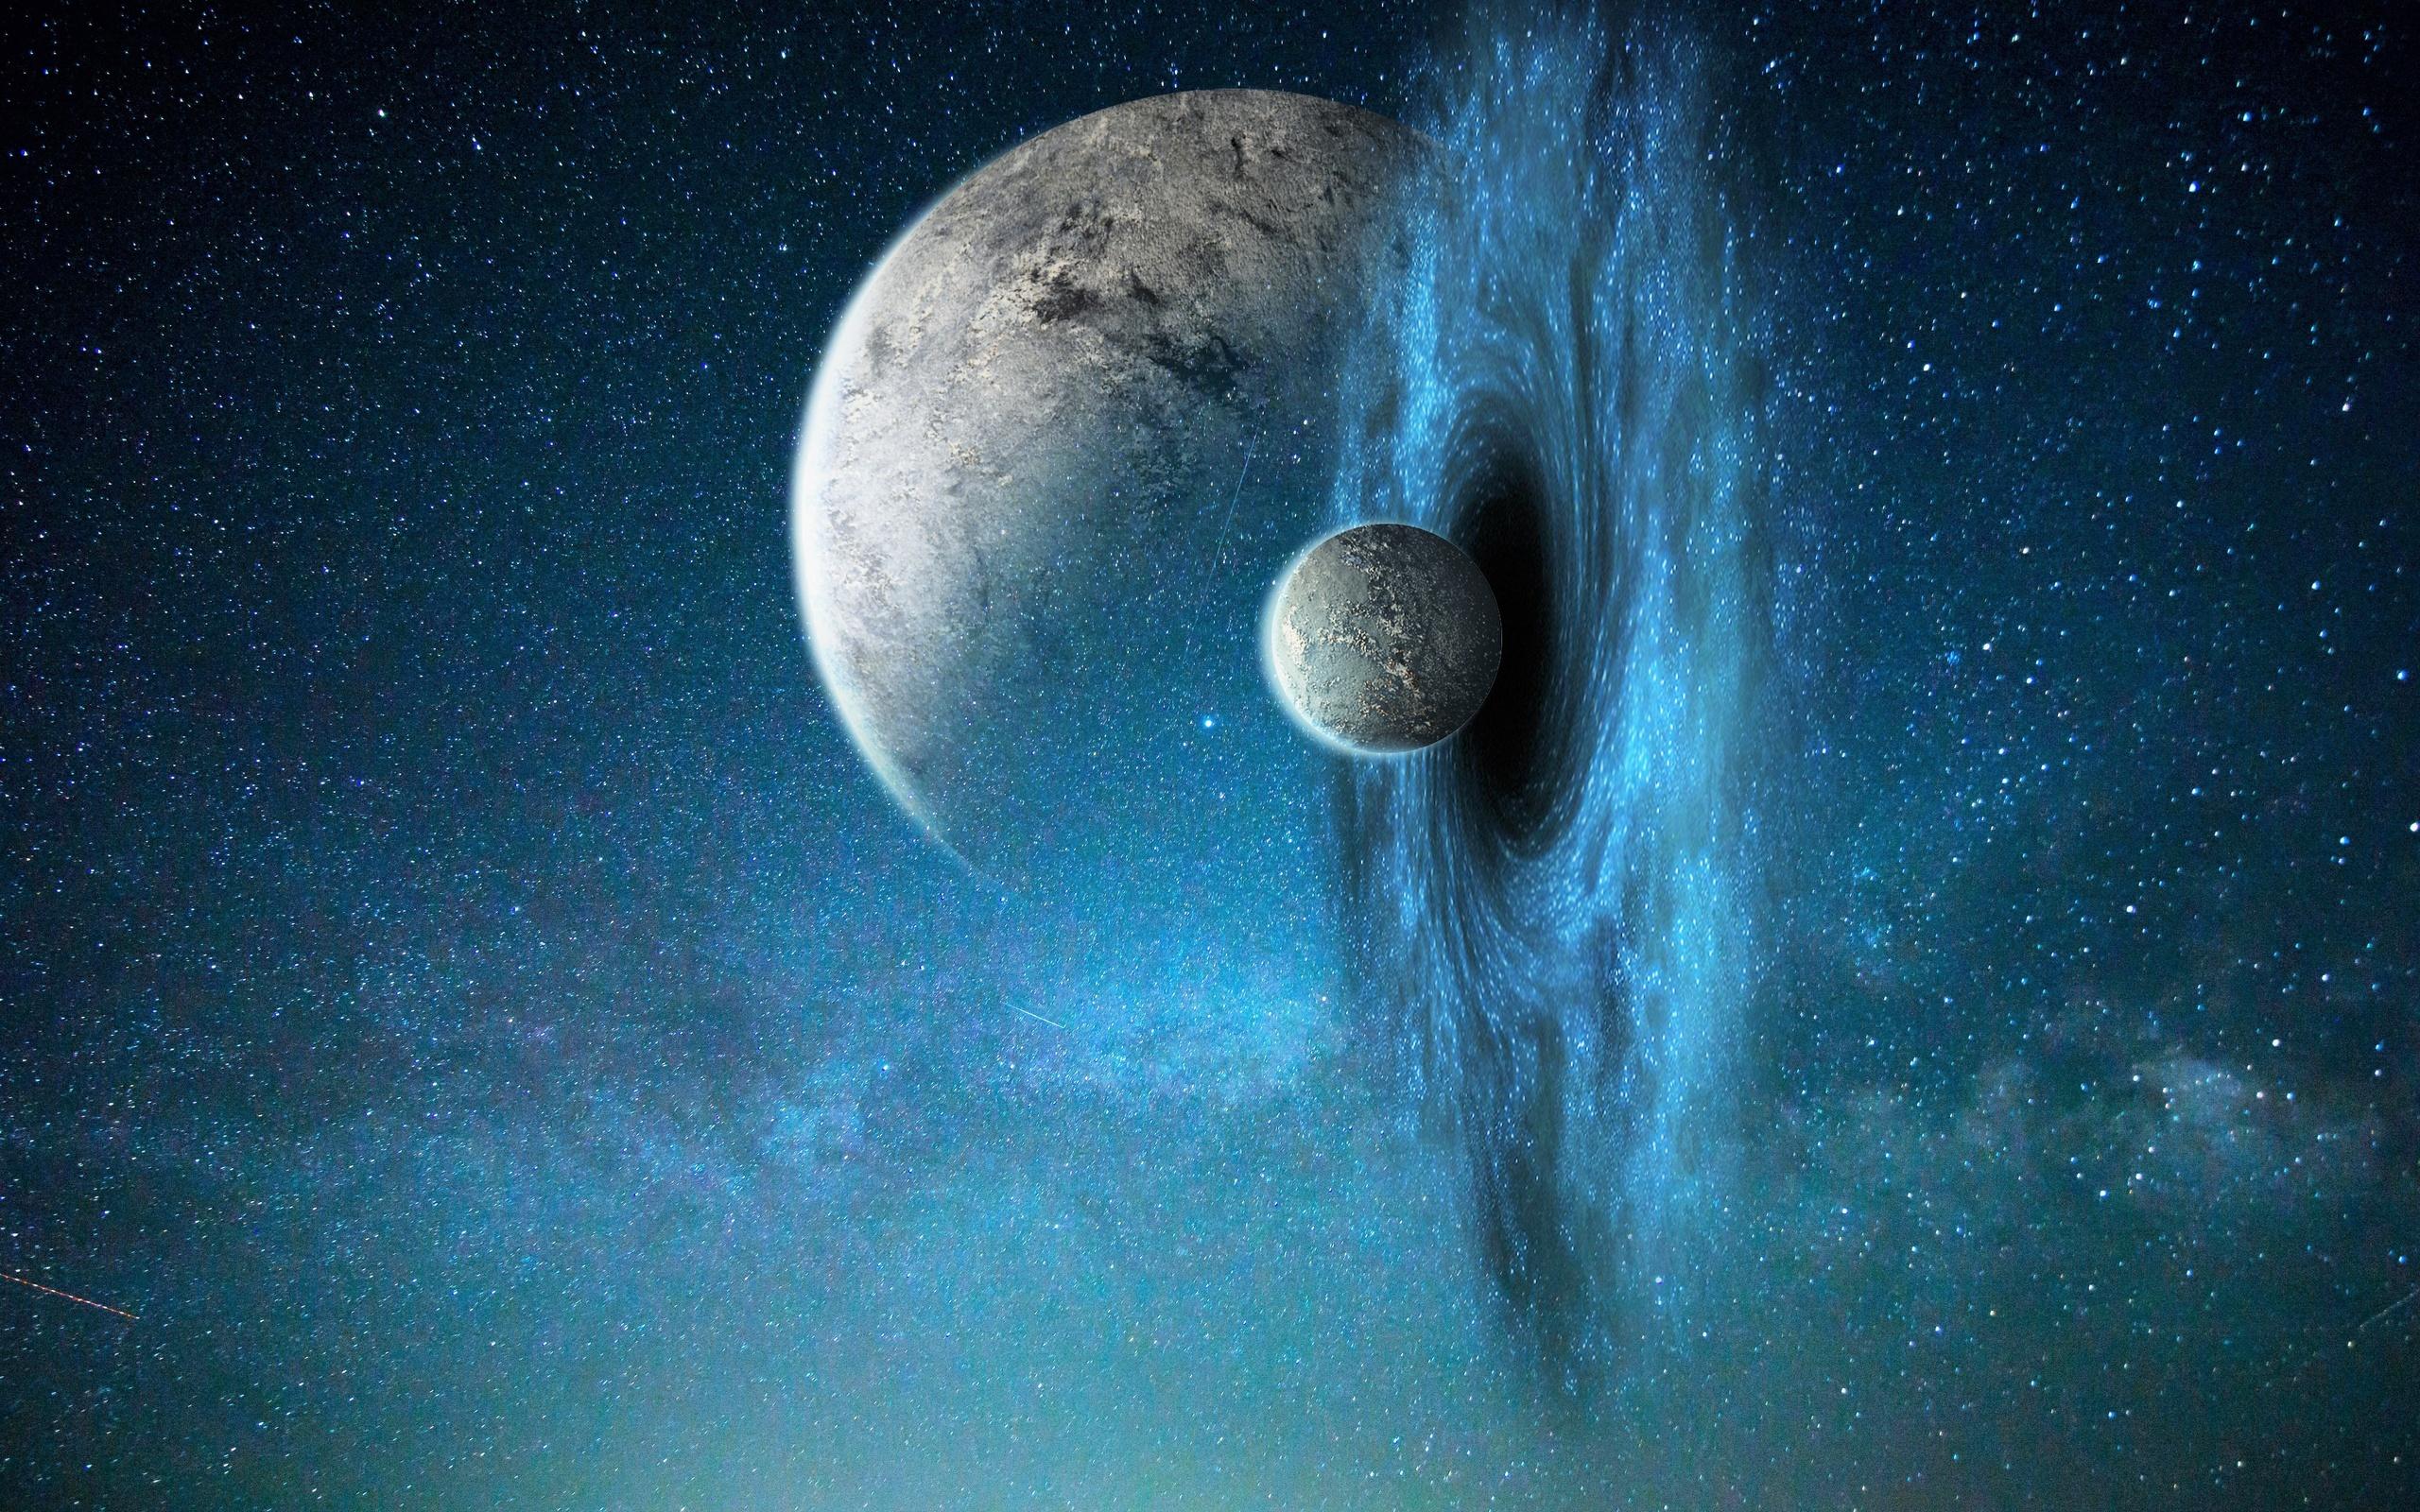 галактика, планета, спутник, червоточина